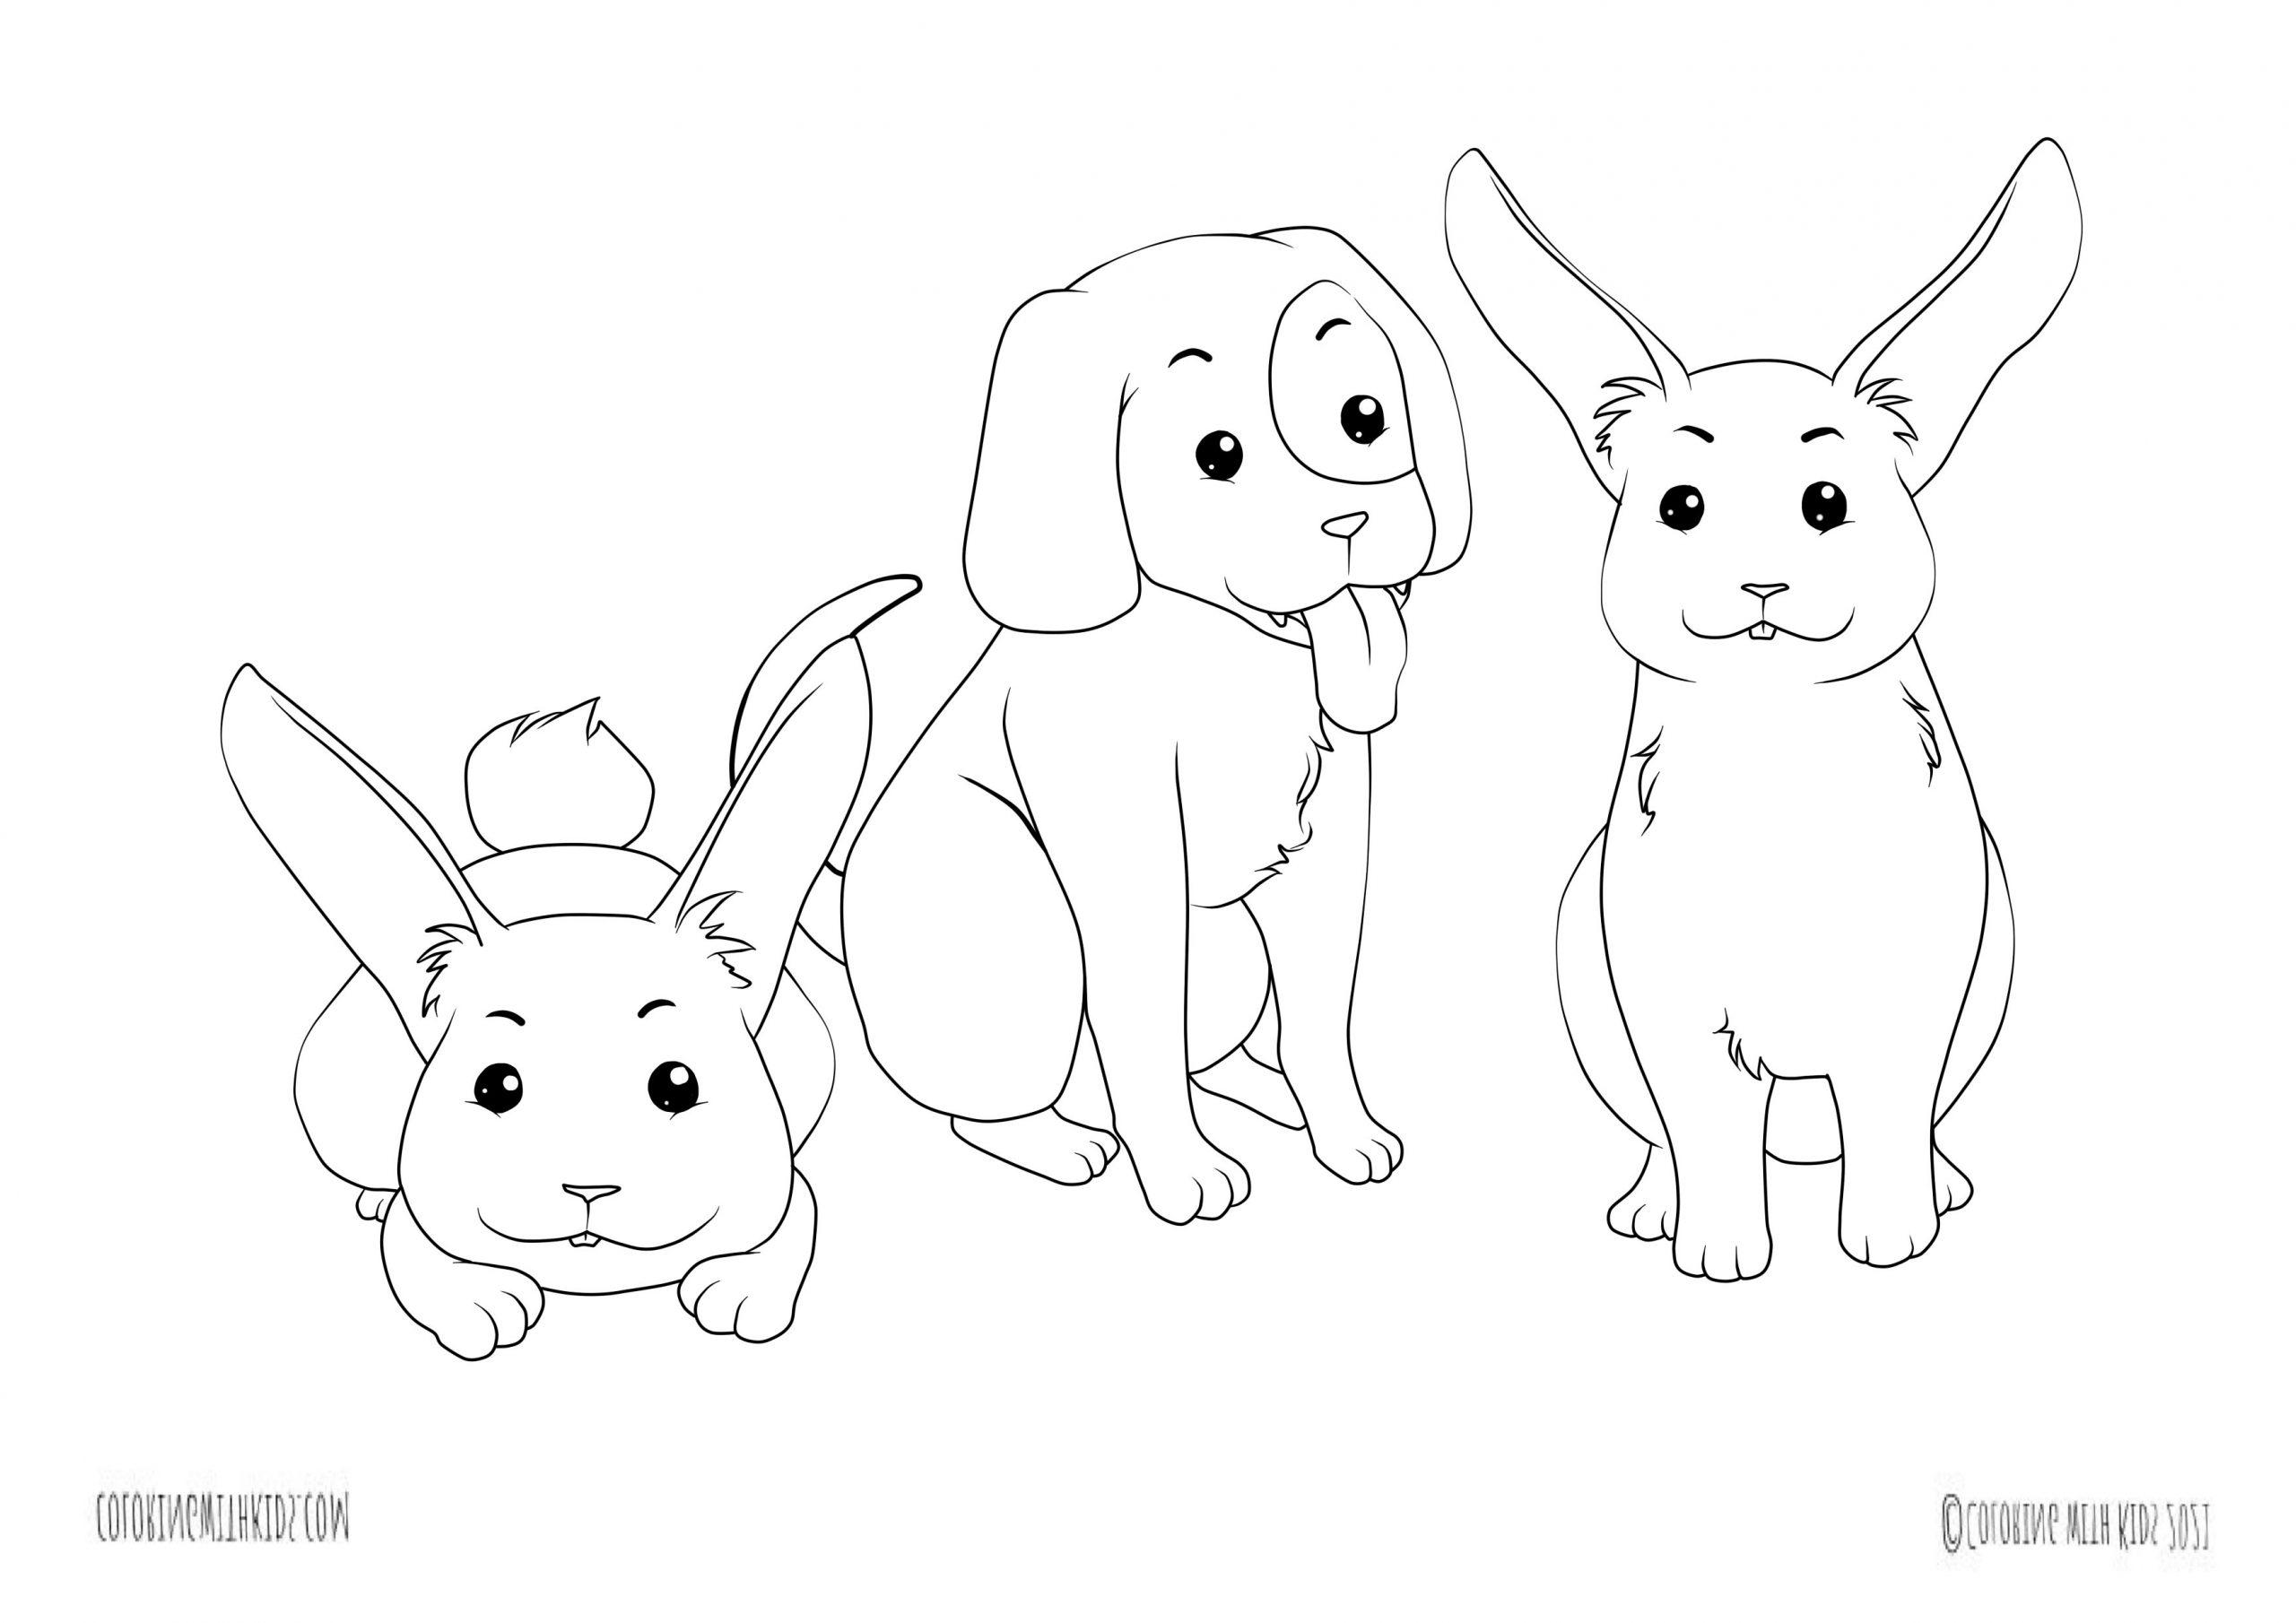 kawaii coloring pages animals